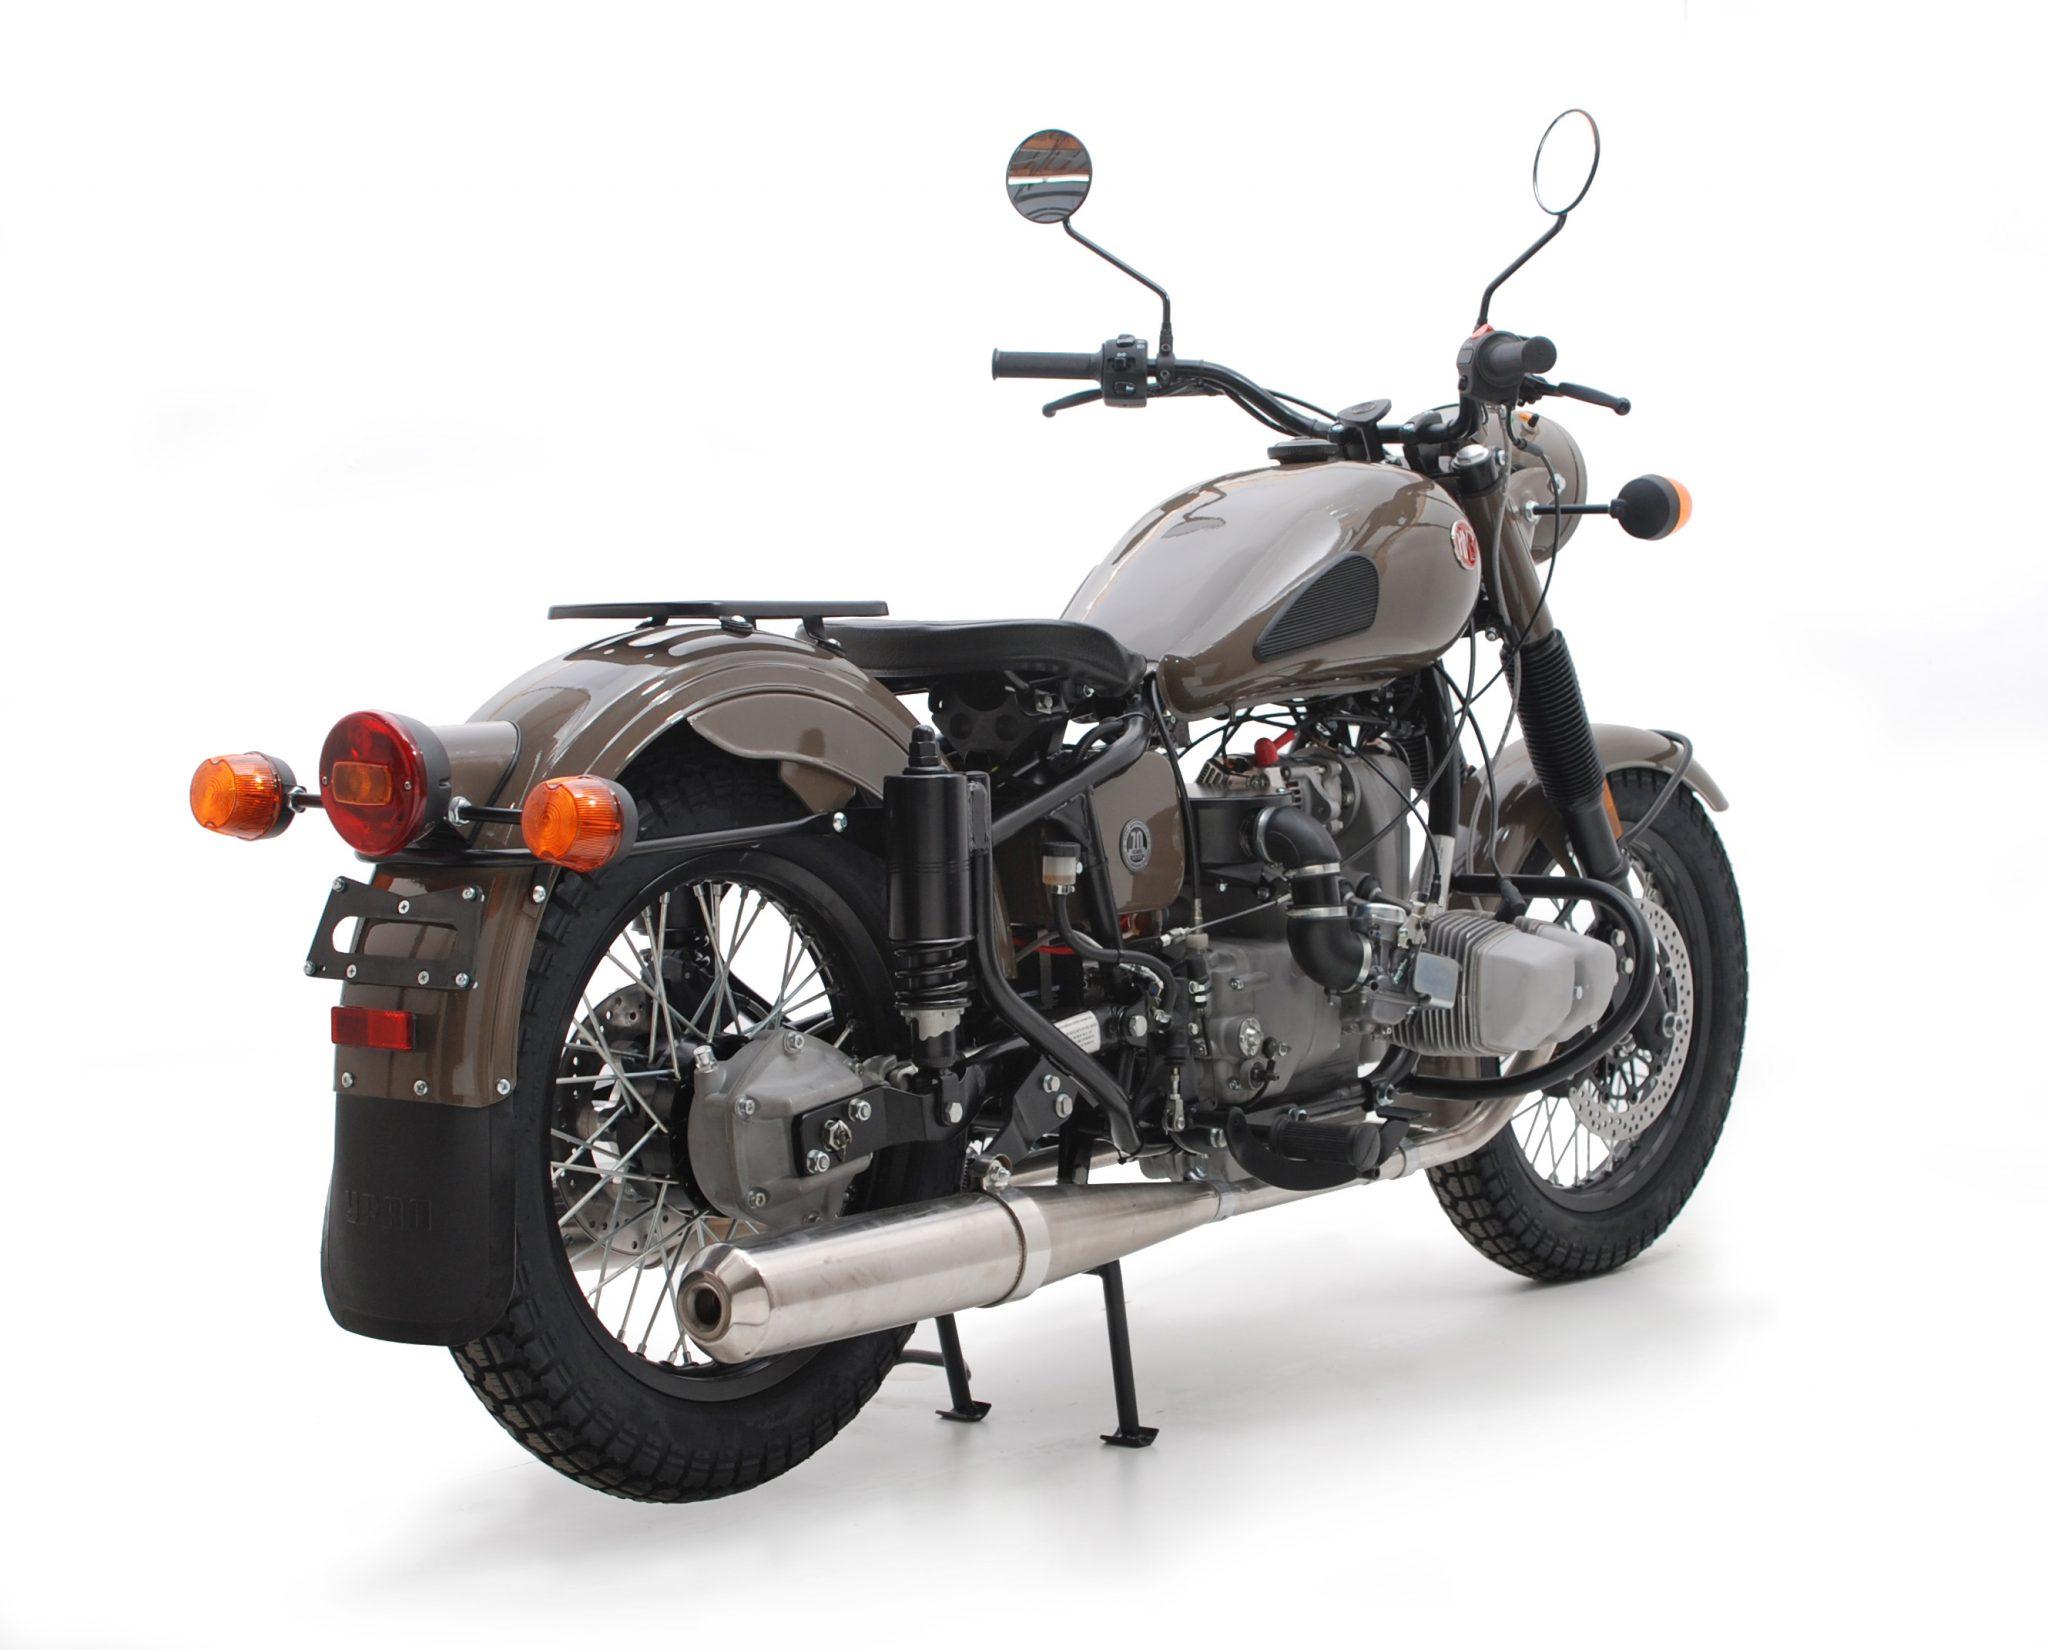 Ural M70 Motorbike The Ural M70